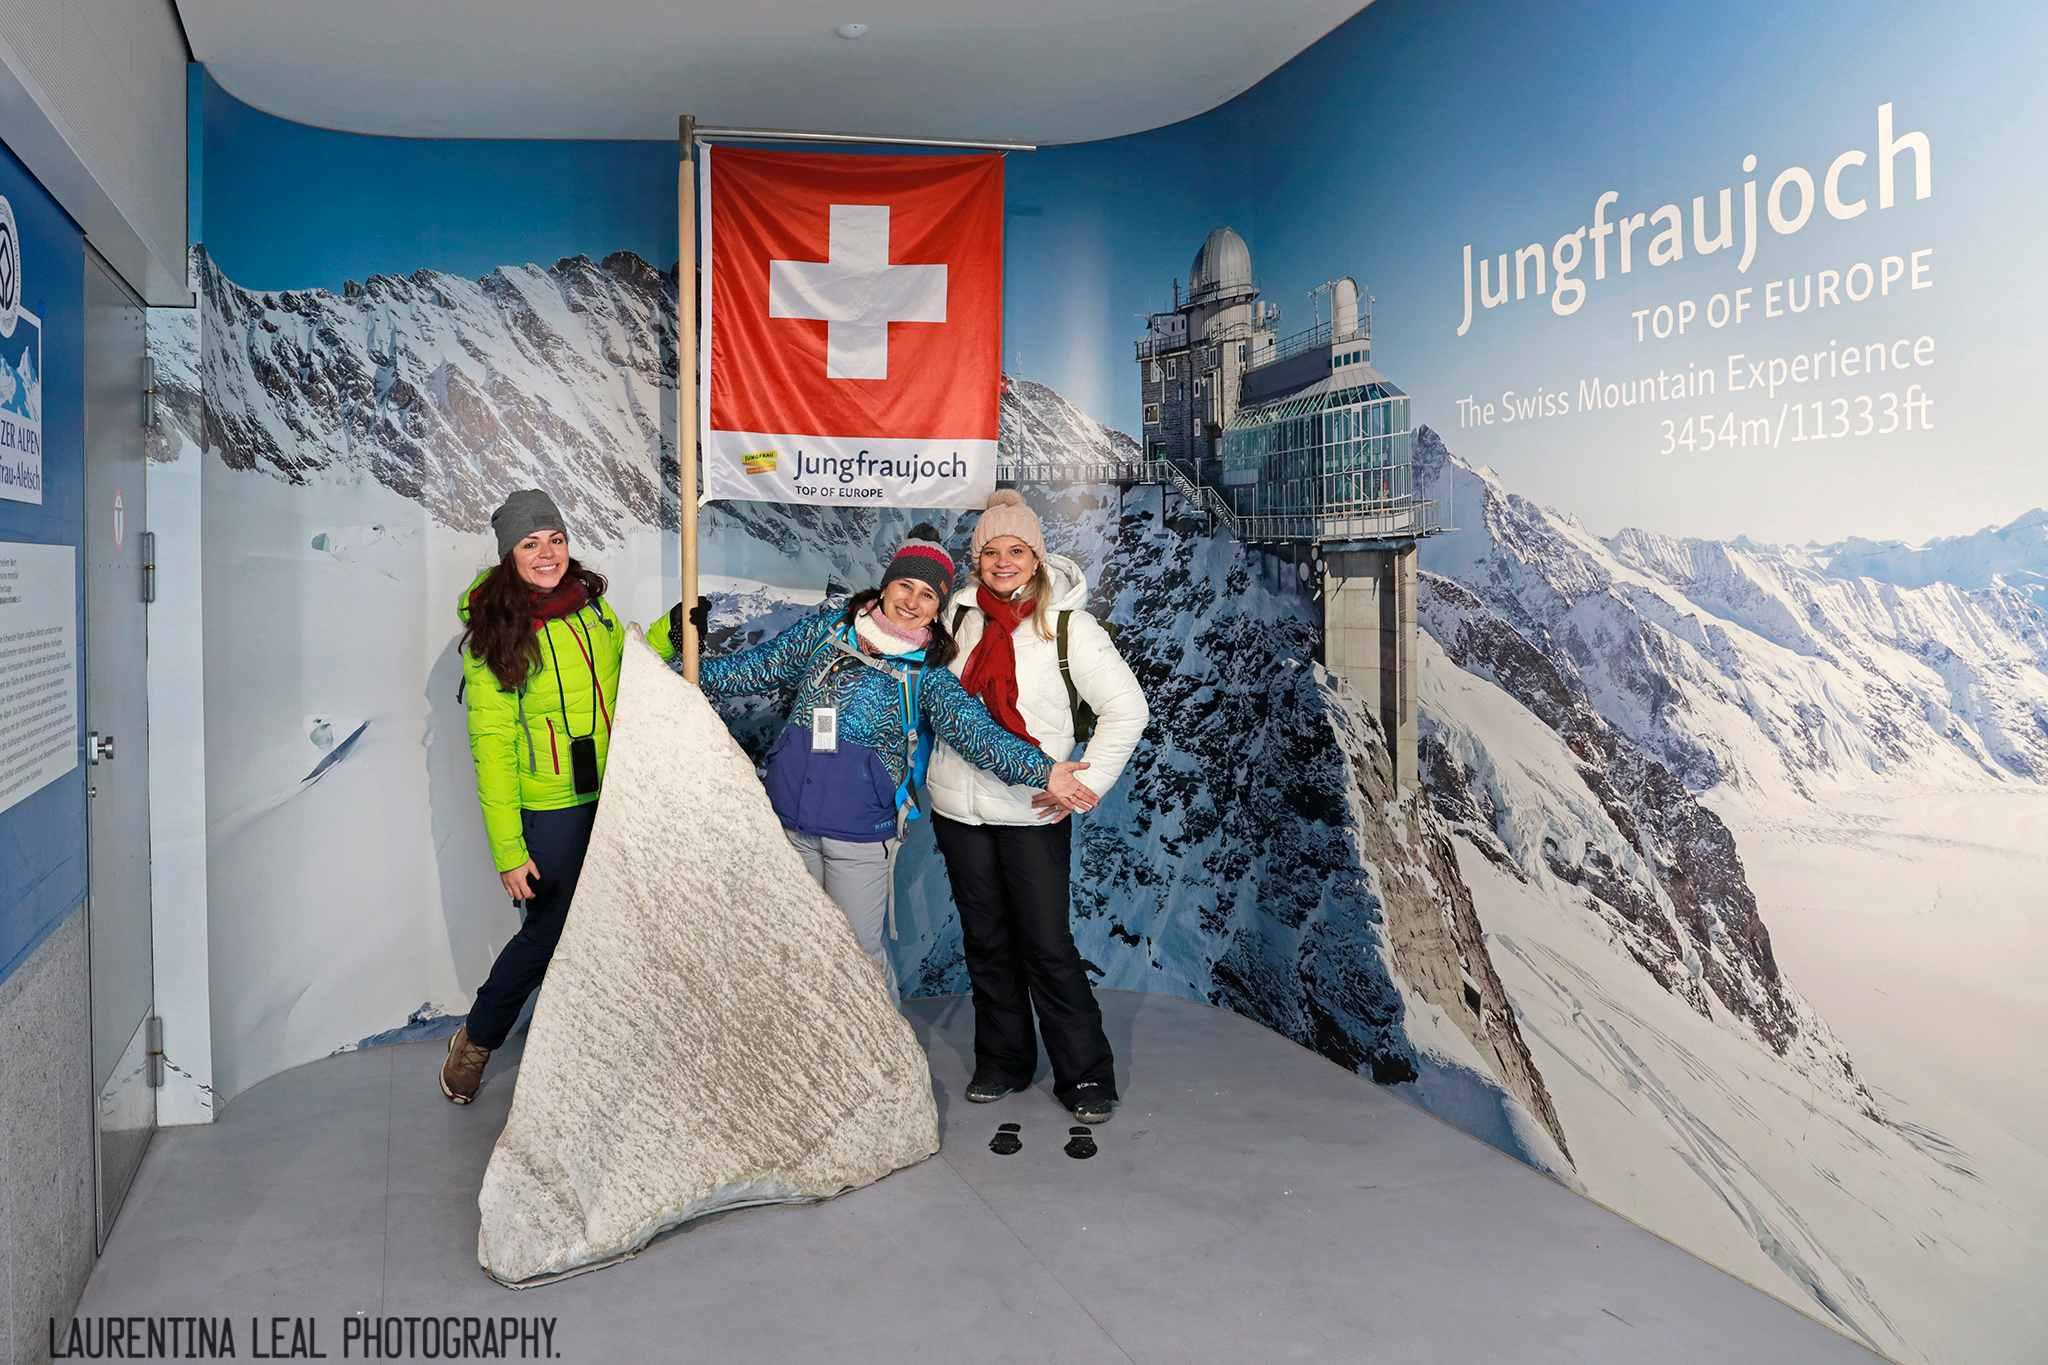 novidades passeio jungfraujoch